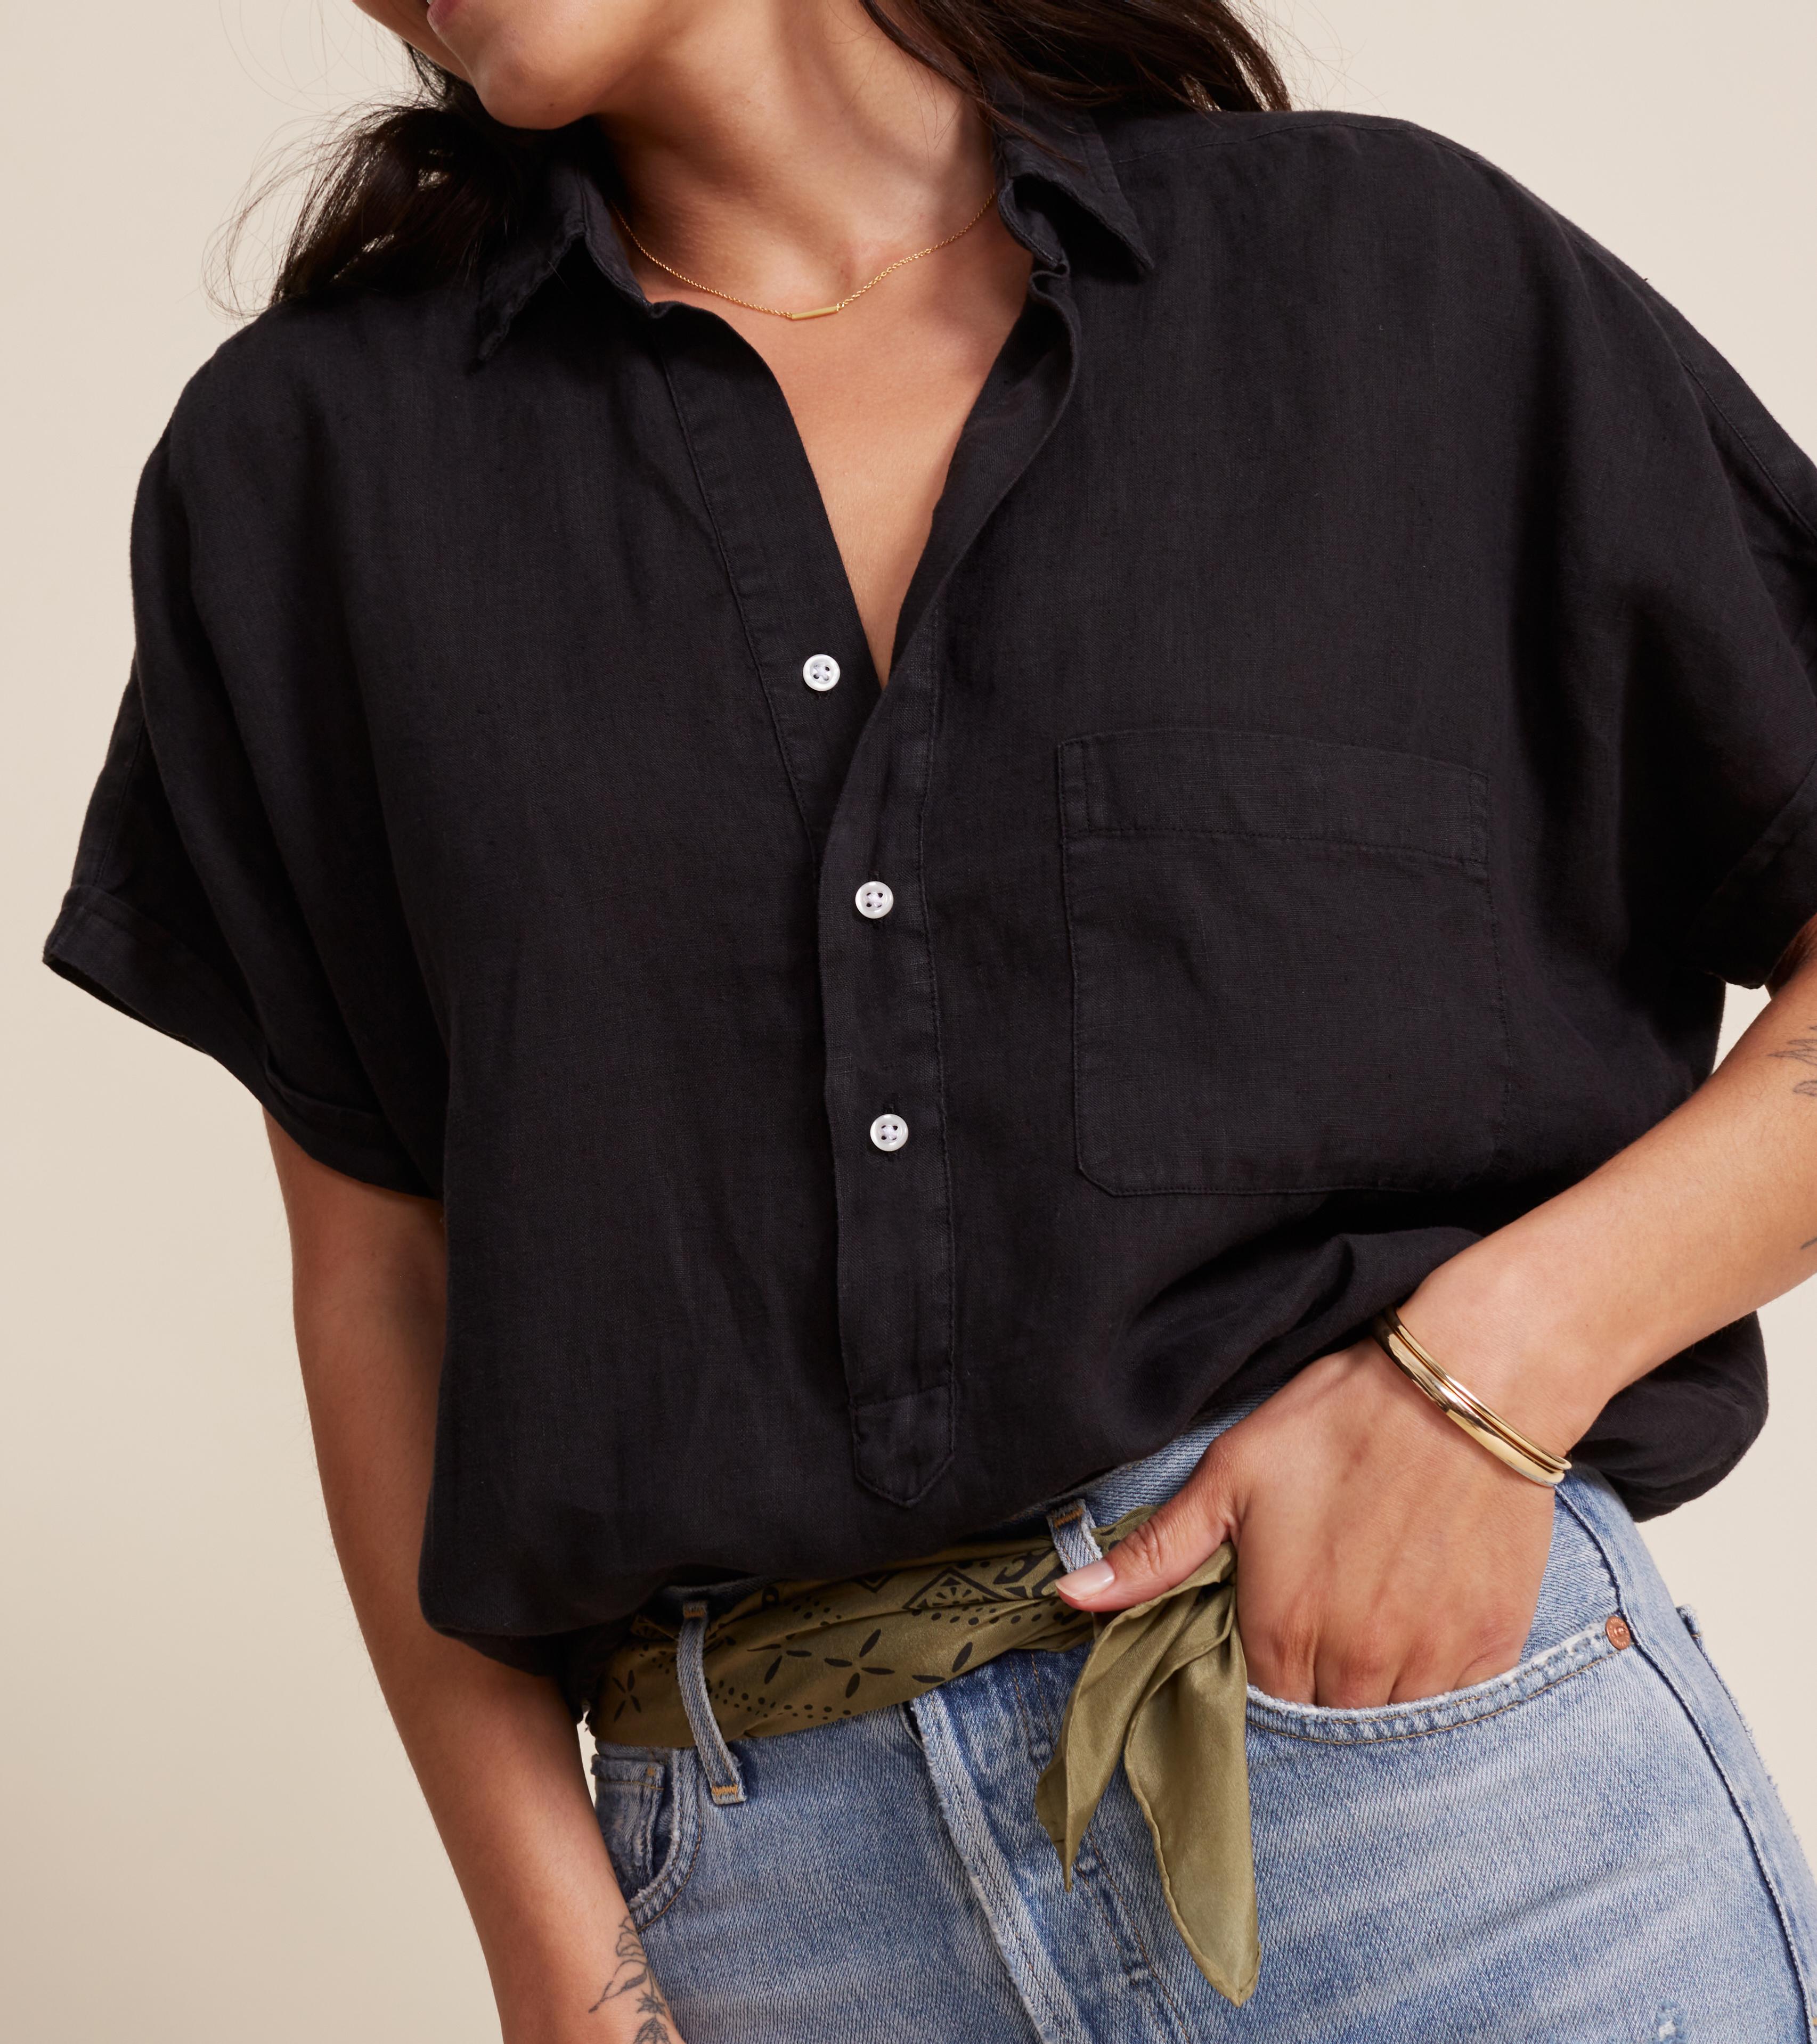 Image of The Artist Short Sleeve Shirt Black, Tumbled Linen Final Sale